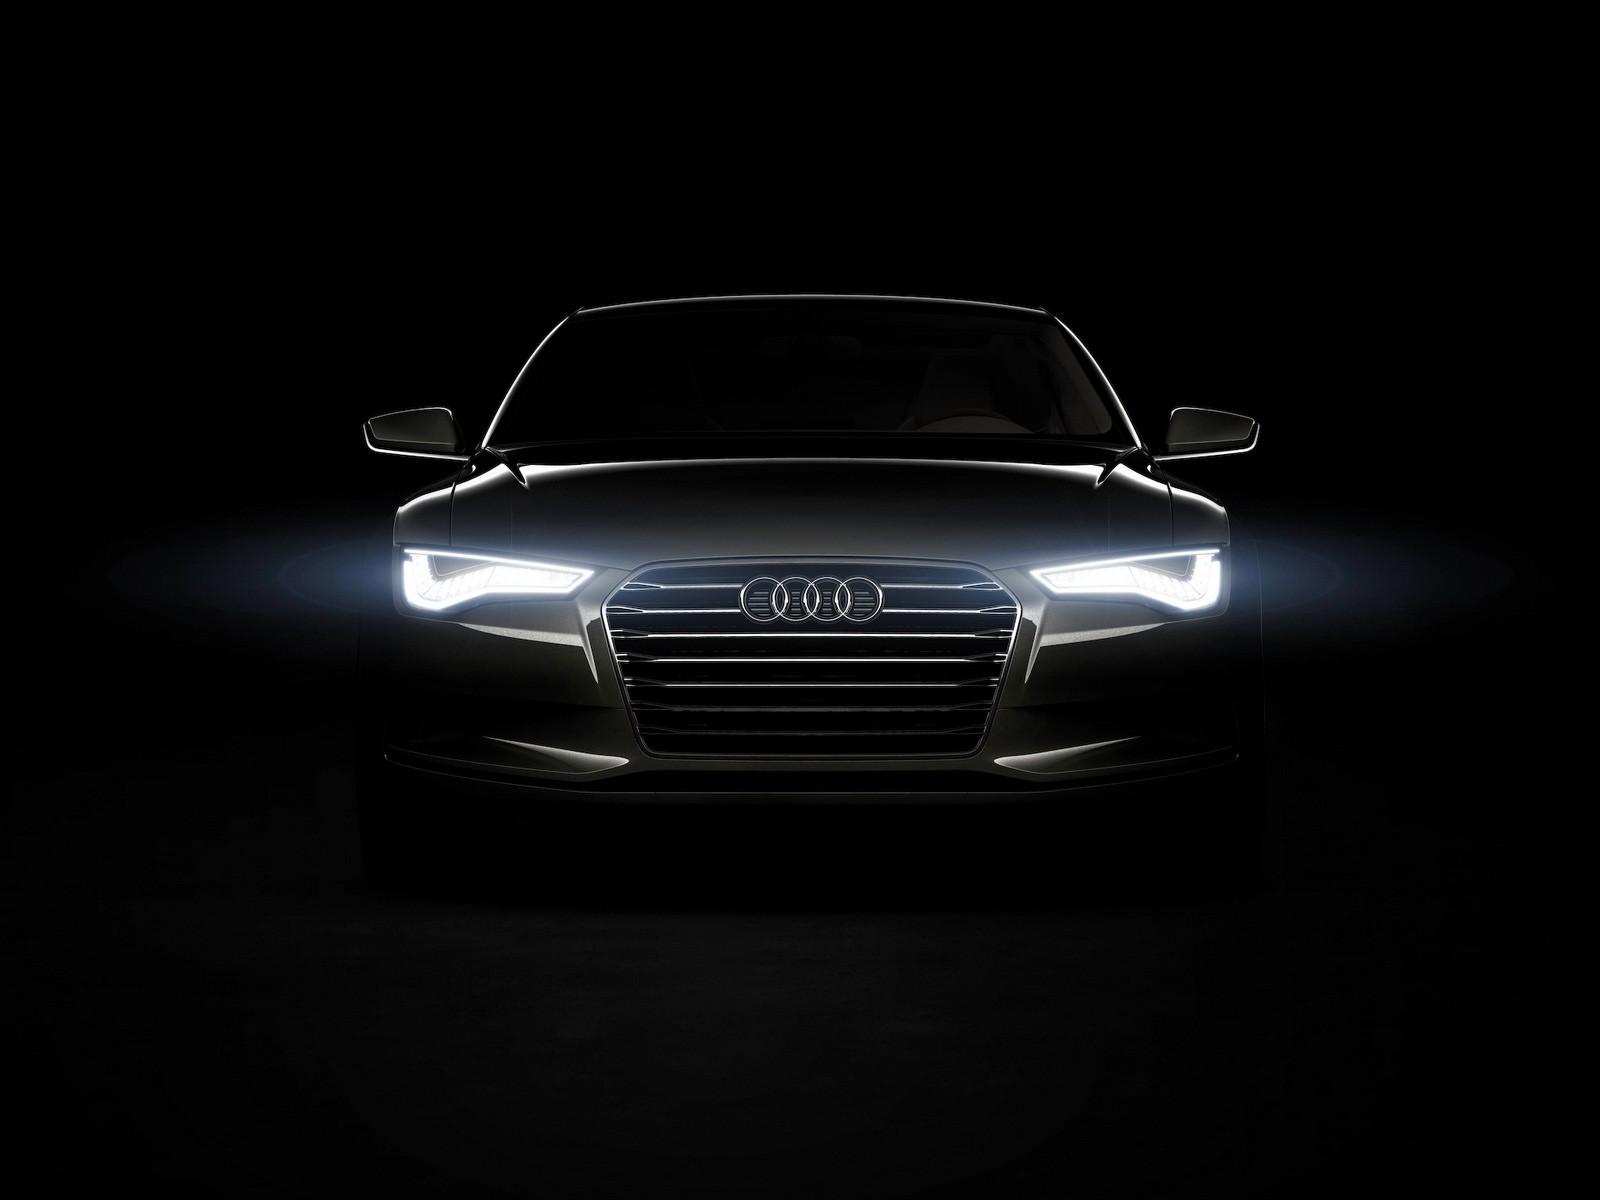 Audi Wallpaper · Audi Wallpaper · Audi Wallpaper ...